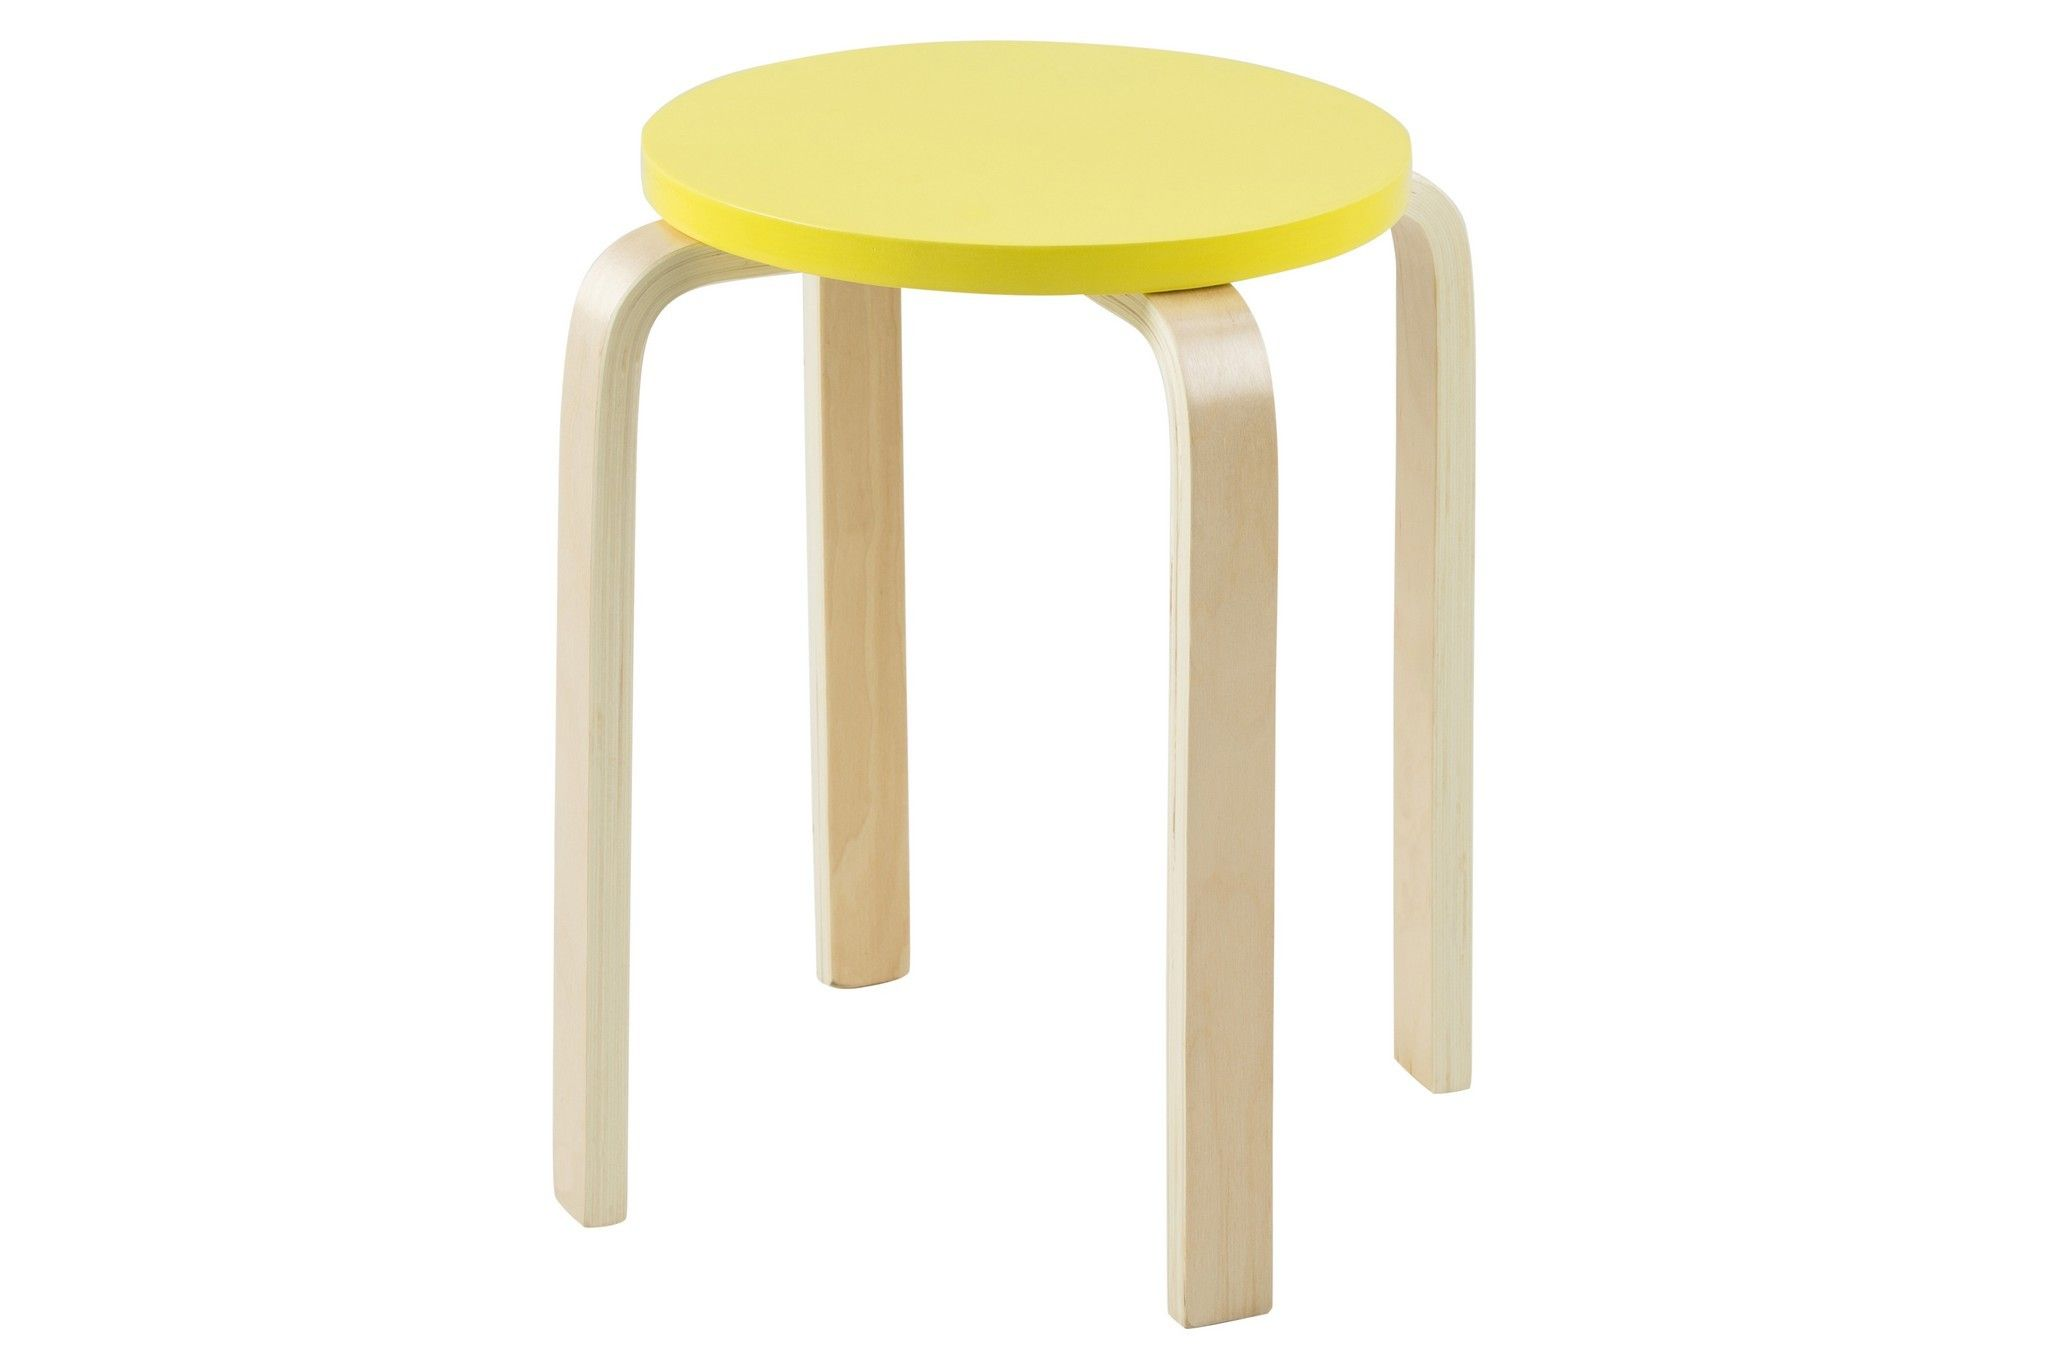 Taboret Emba ż³Å'ty 59 zł Scandinavian interior chair